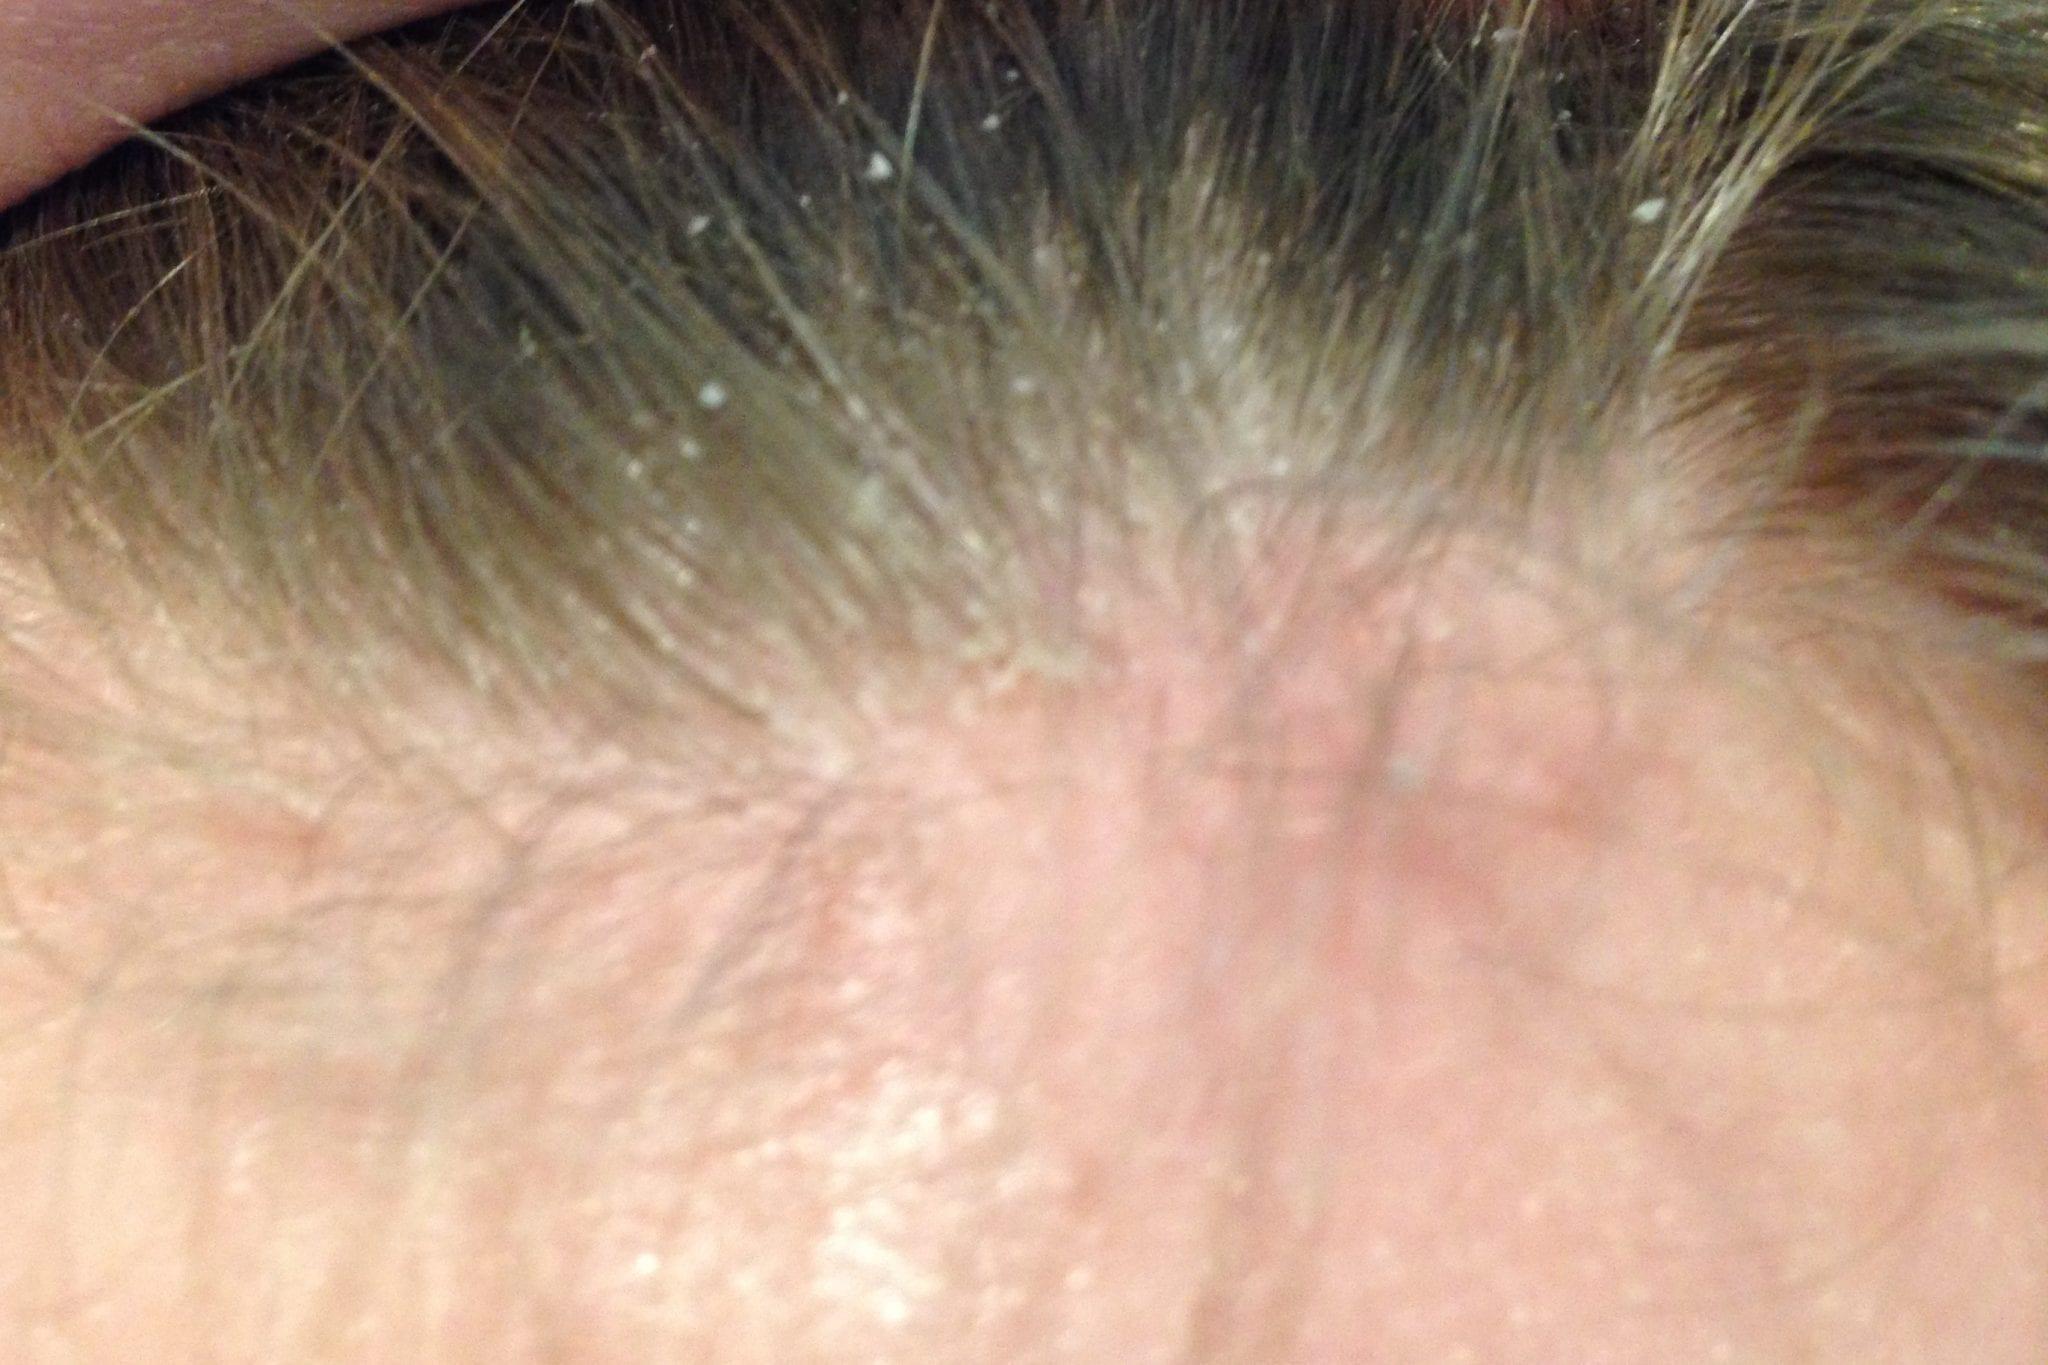 dcc-Seborrheic-dermatitis-scalp-e